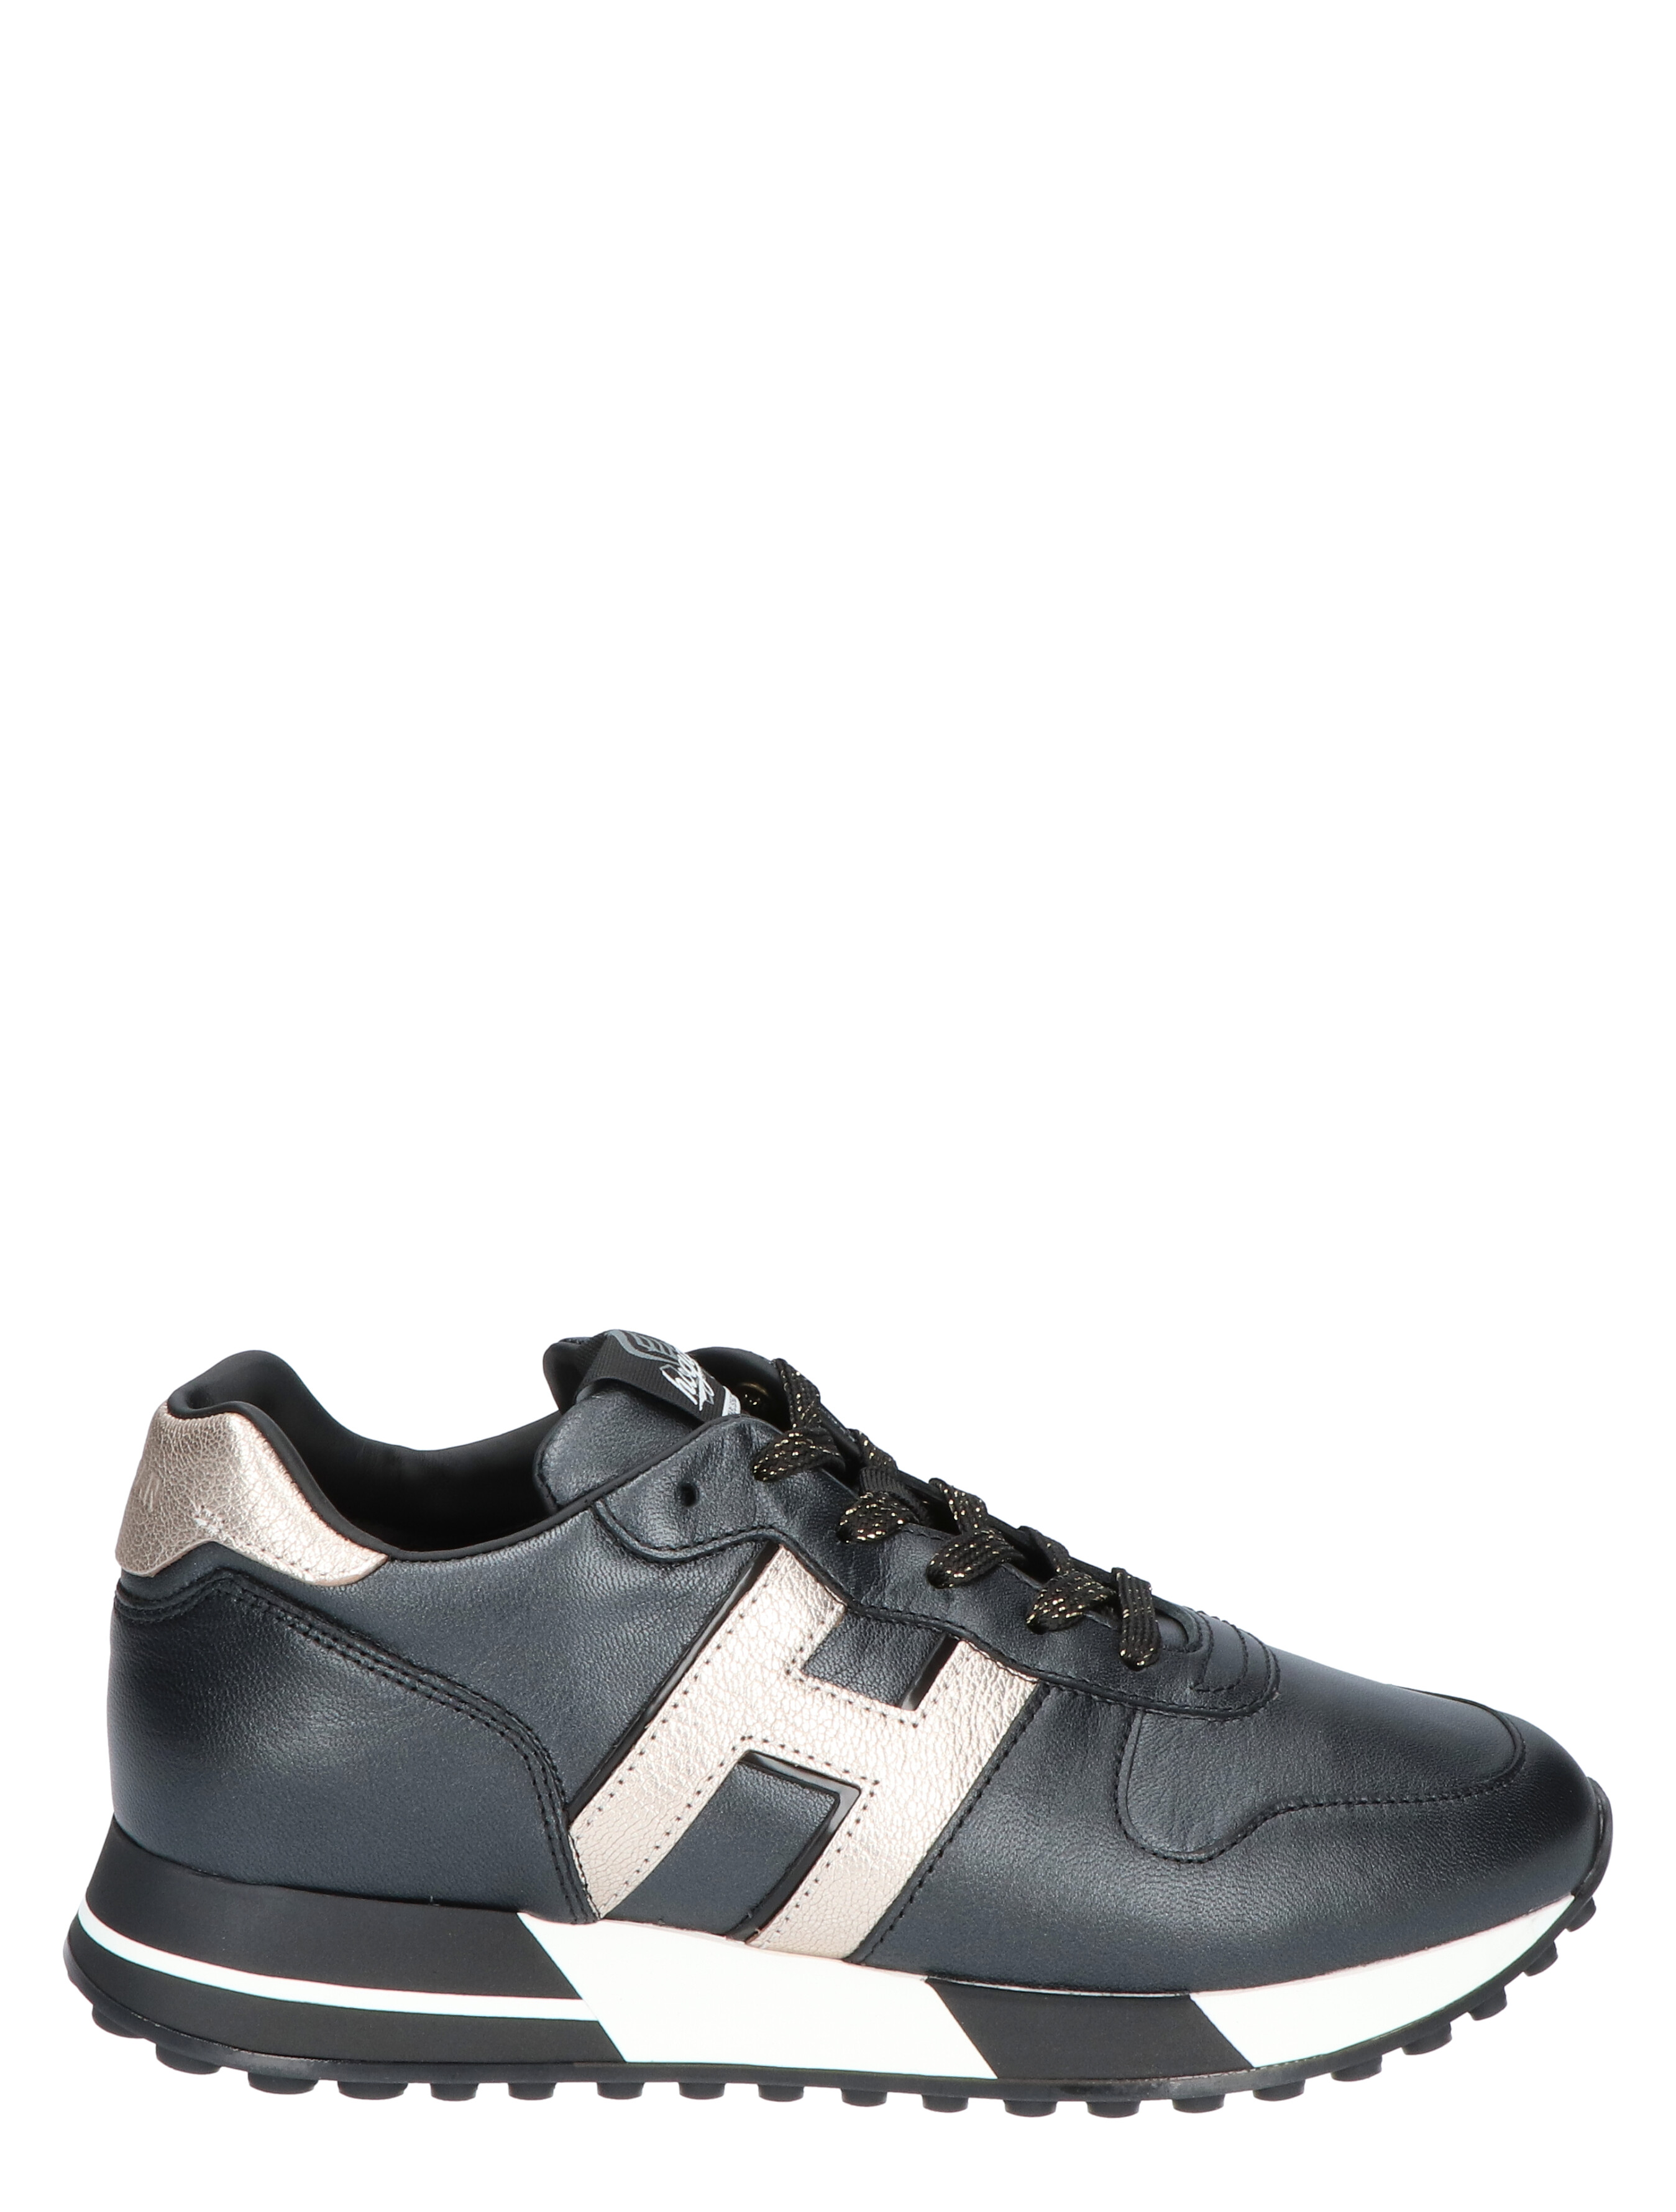 Hogan H383 Black Sneakers